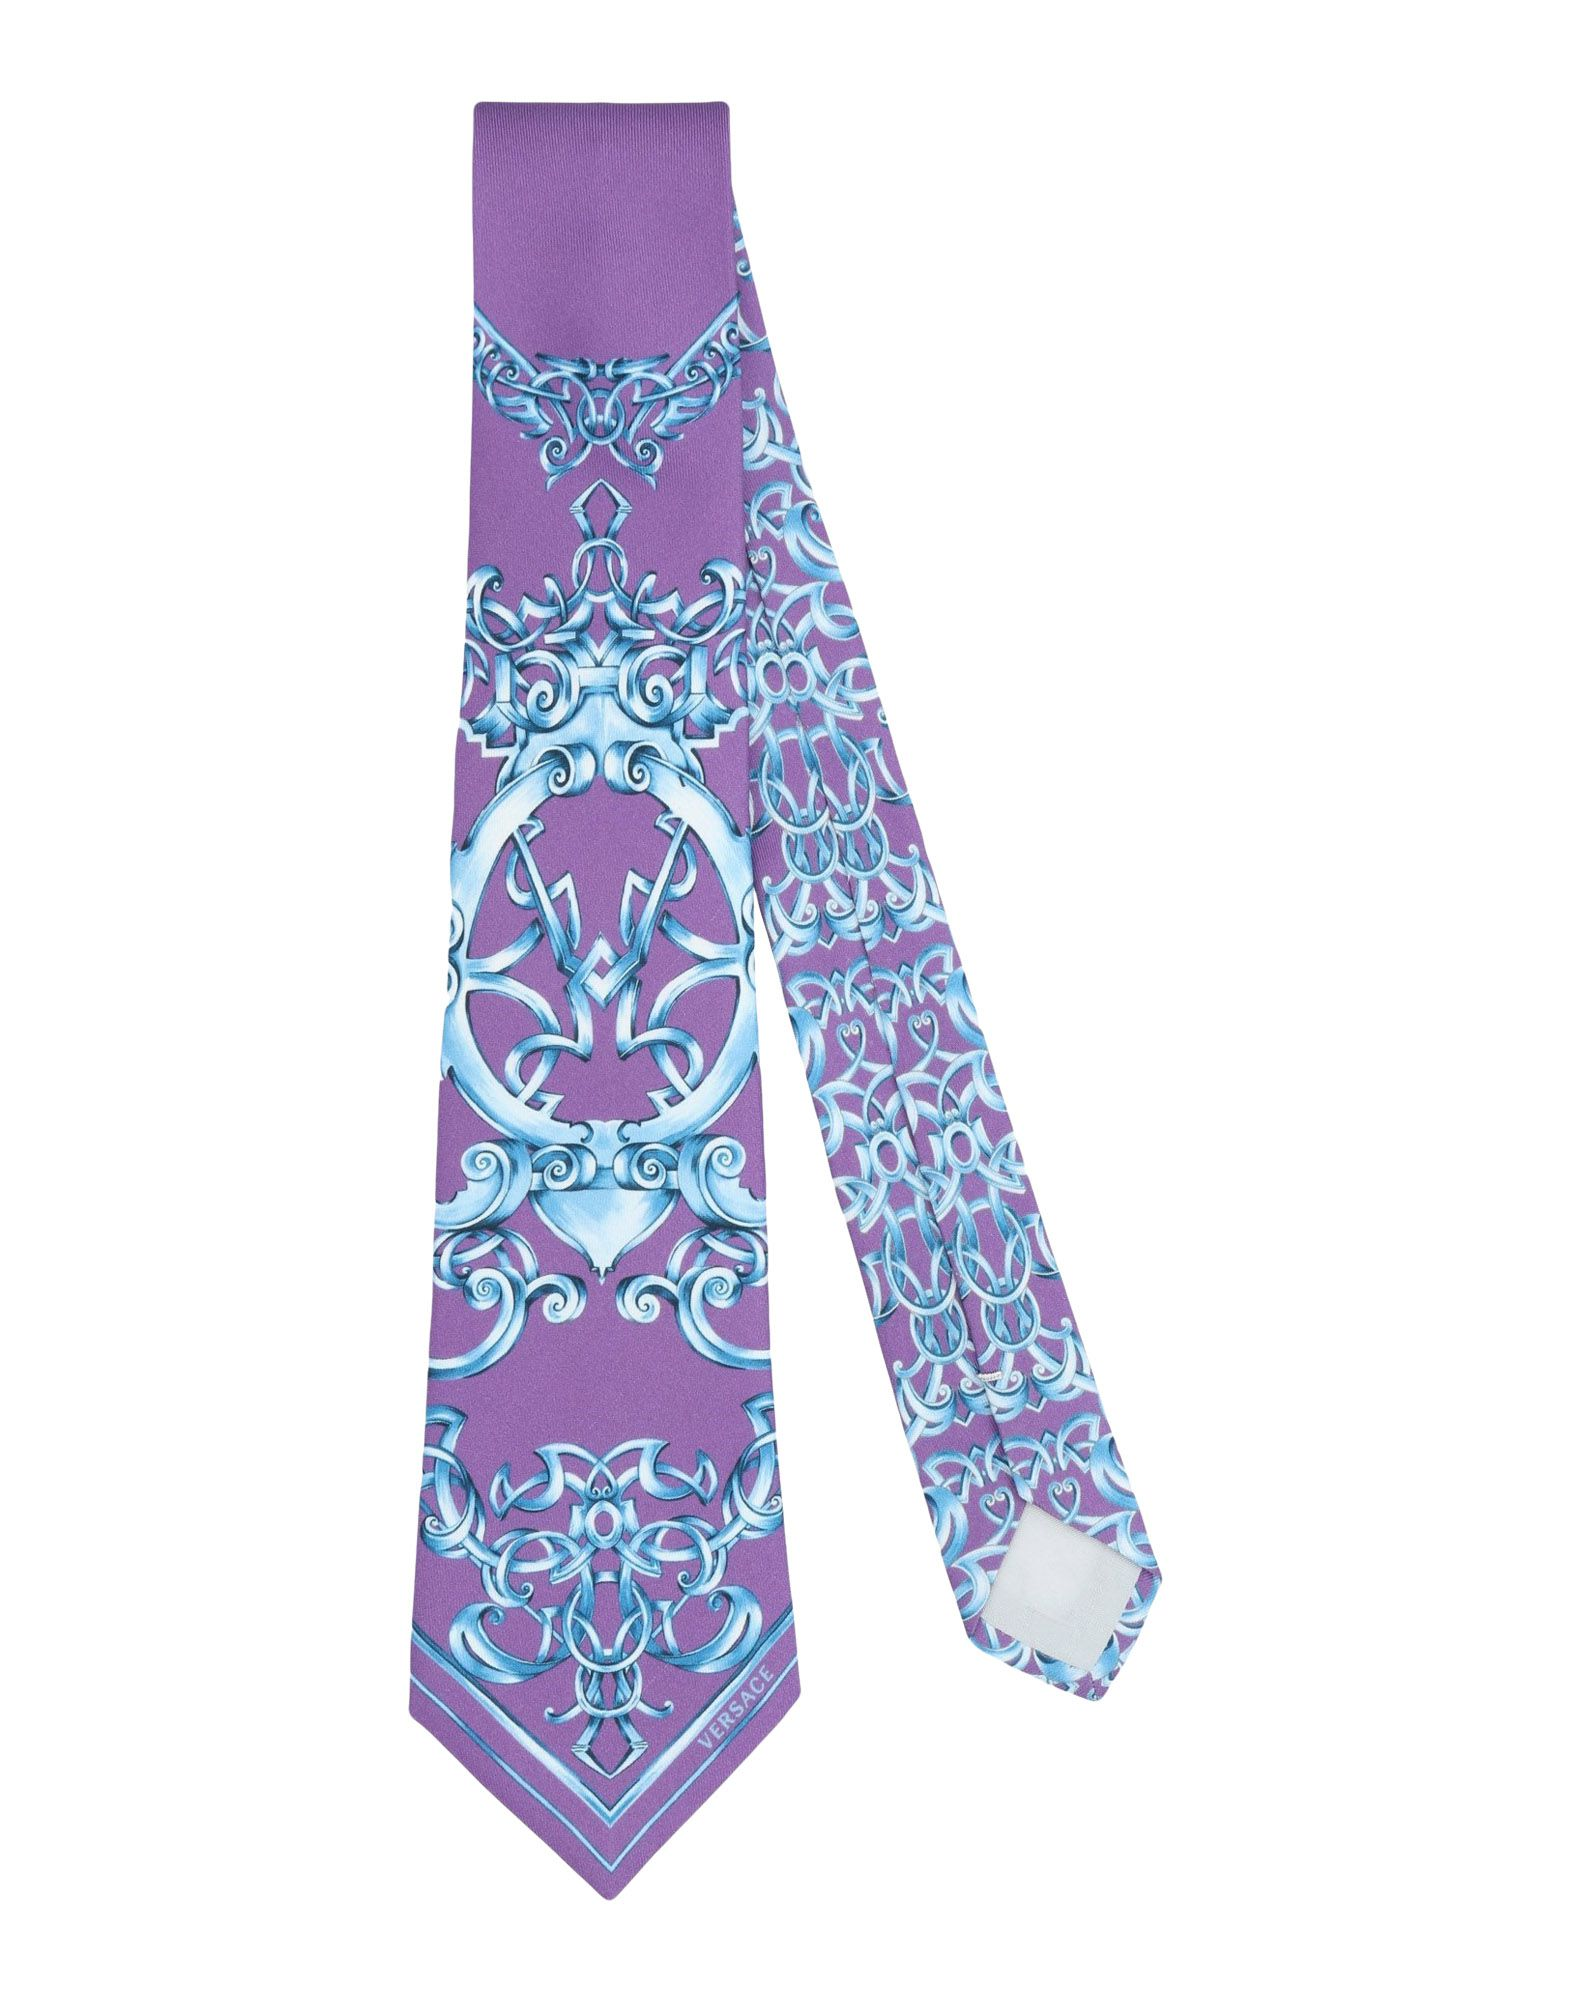 GIANNI VERSACE Галстук versace бордовый галстук в клетку внизу с логотипом versace 821752 href